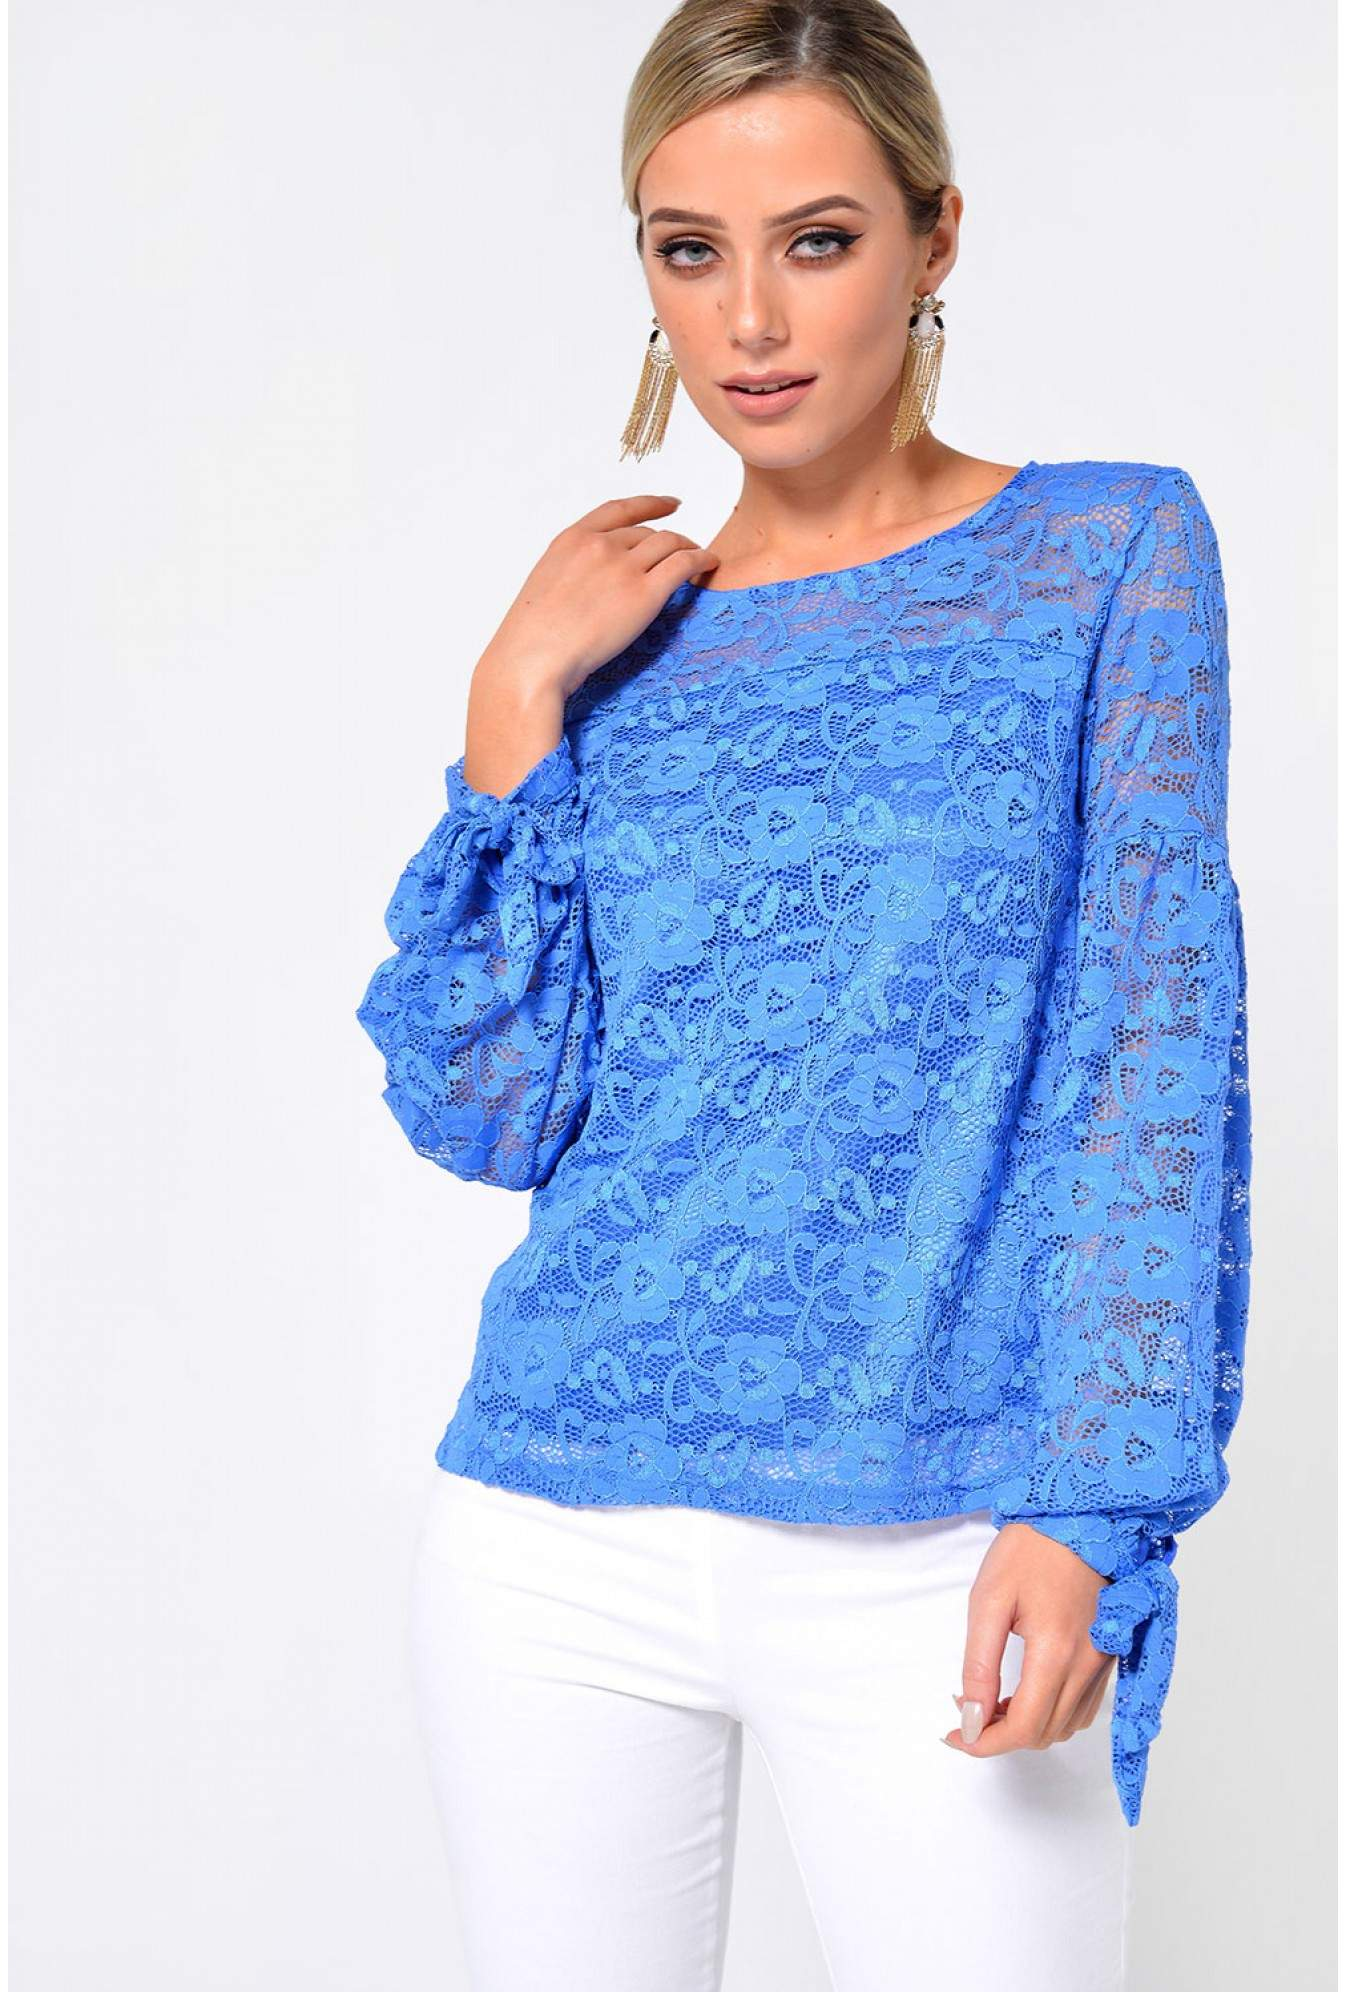 1c9950d7705 Marc Angelo Pippa Long Sleeve Lace Top in Cornflower Blue